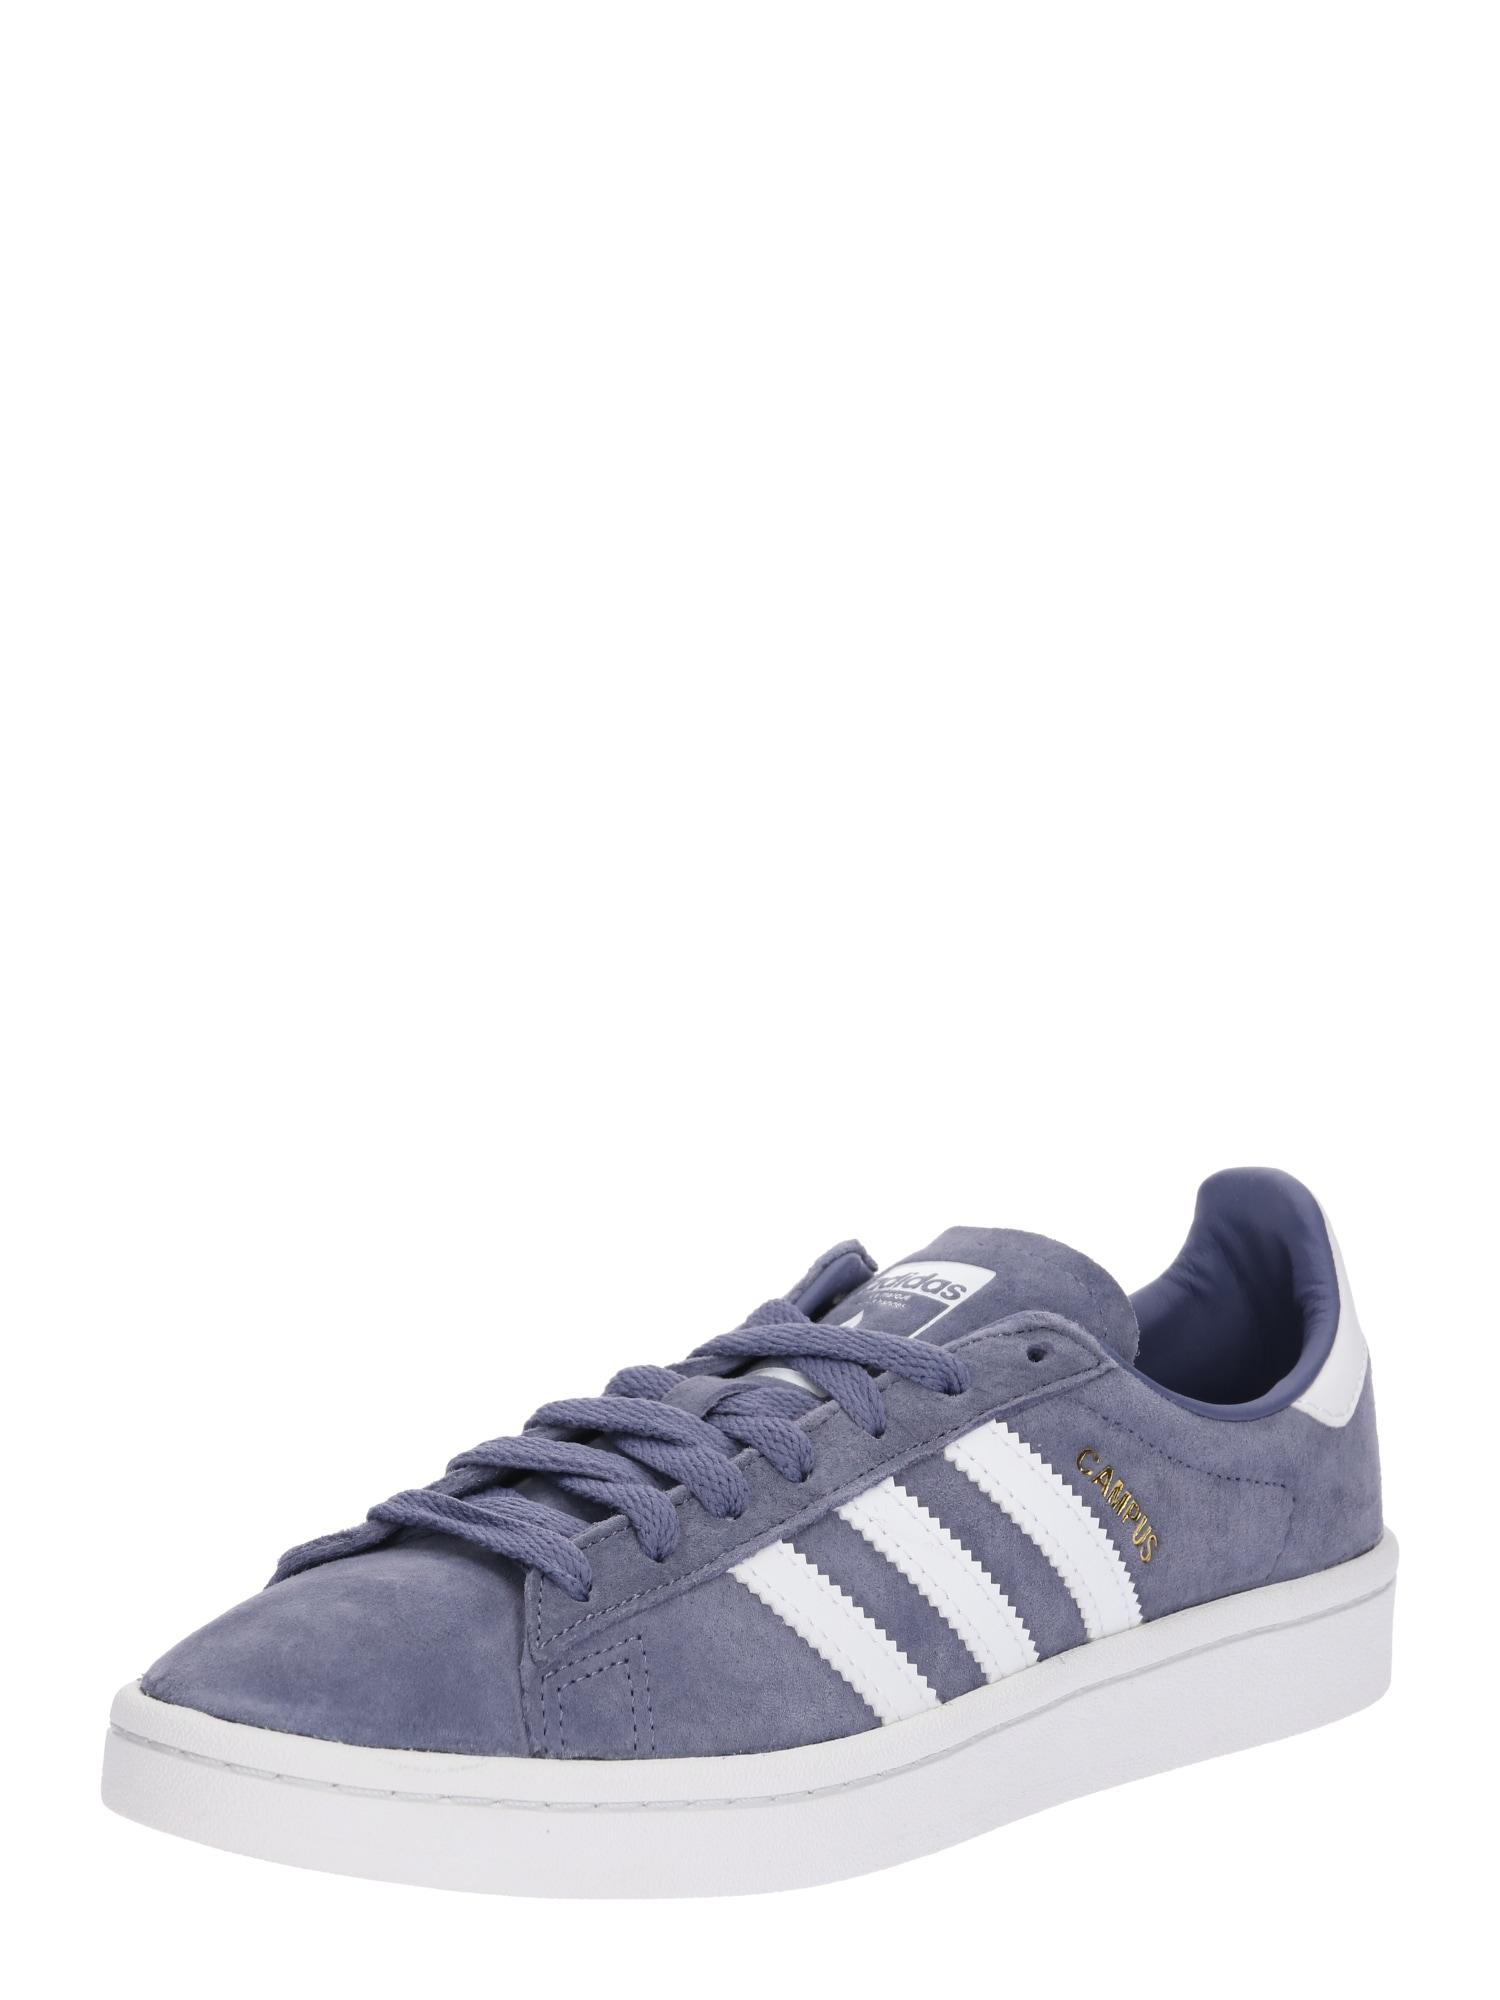 ADIDAS ORIGINALS, Heren Sneakers laag 'Campus', smoky blue / wit